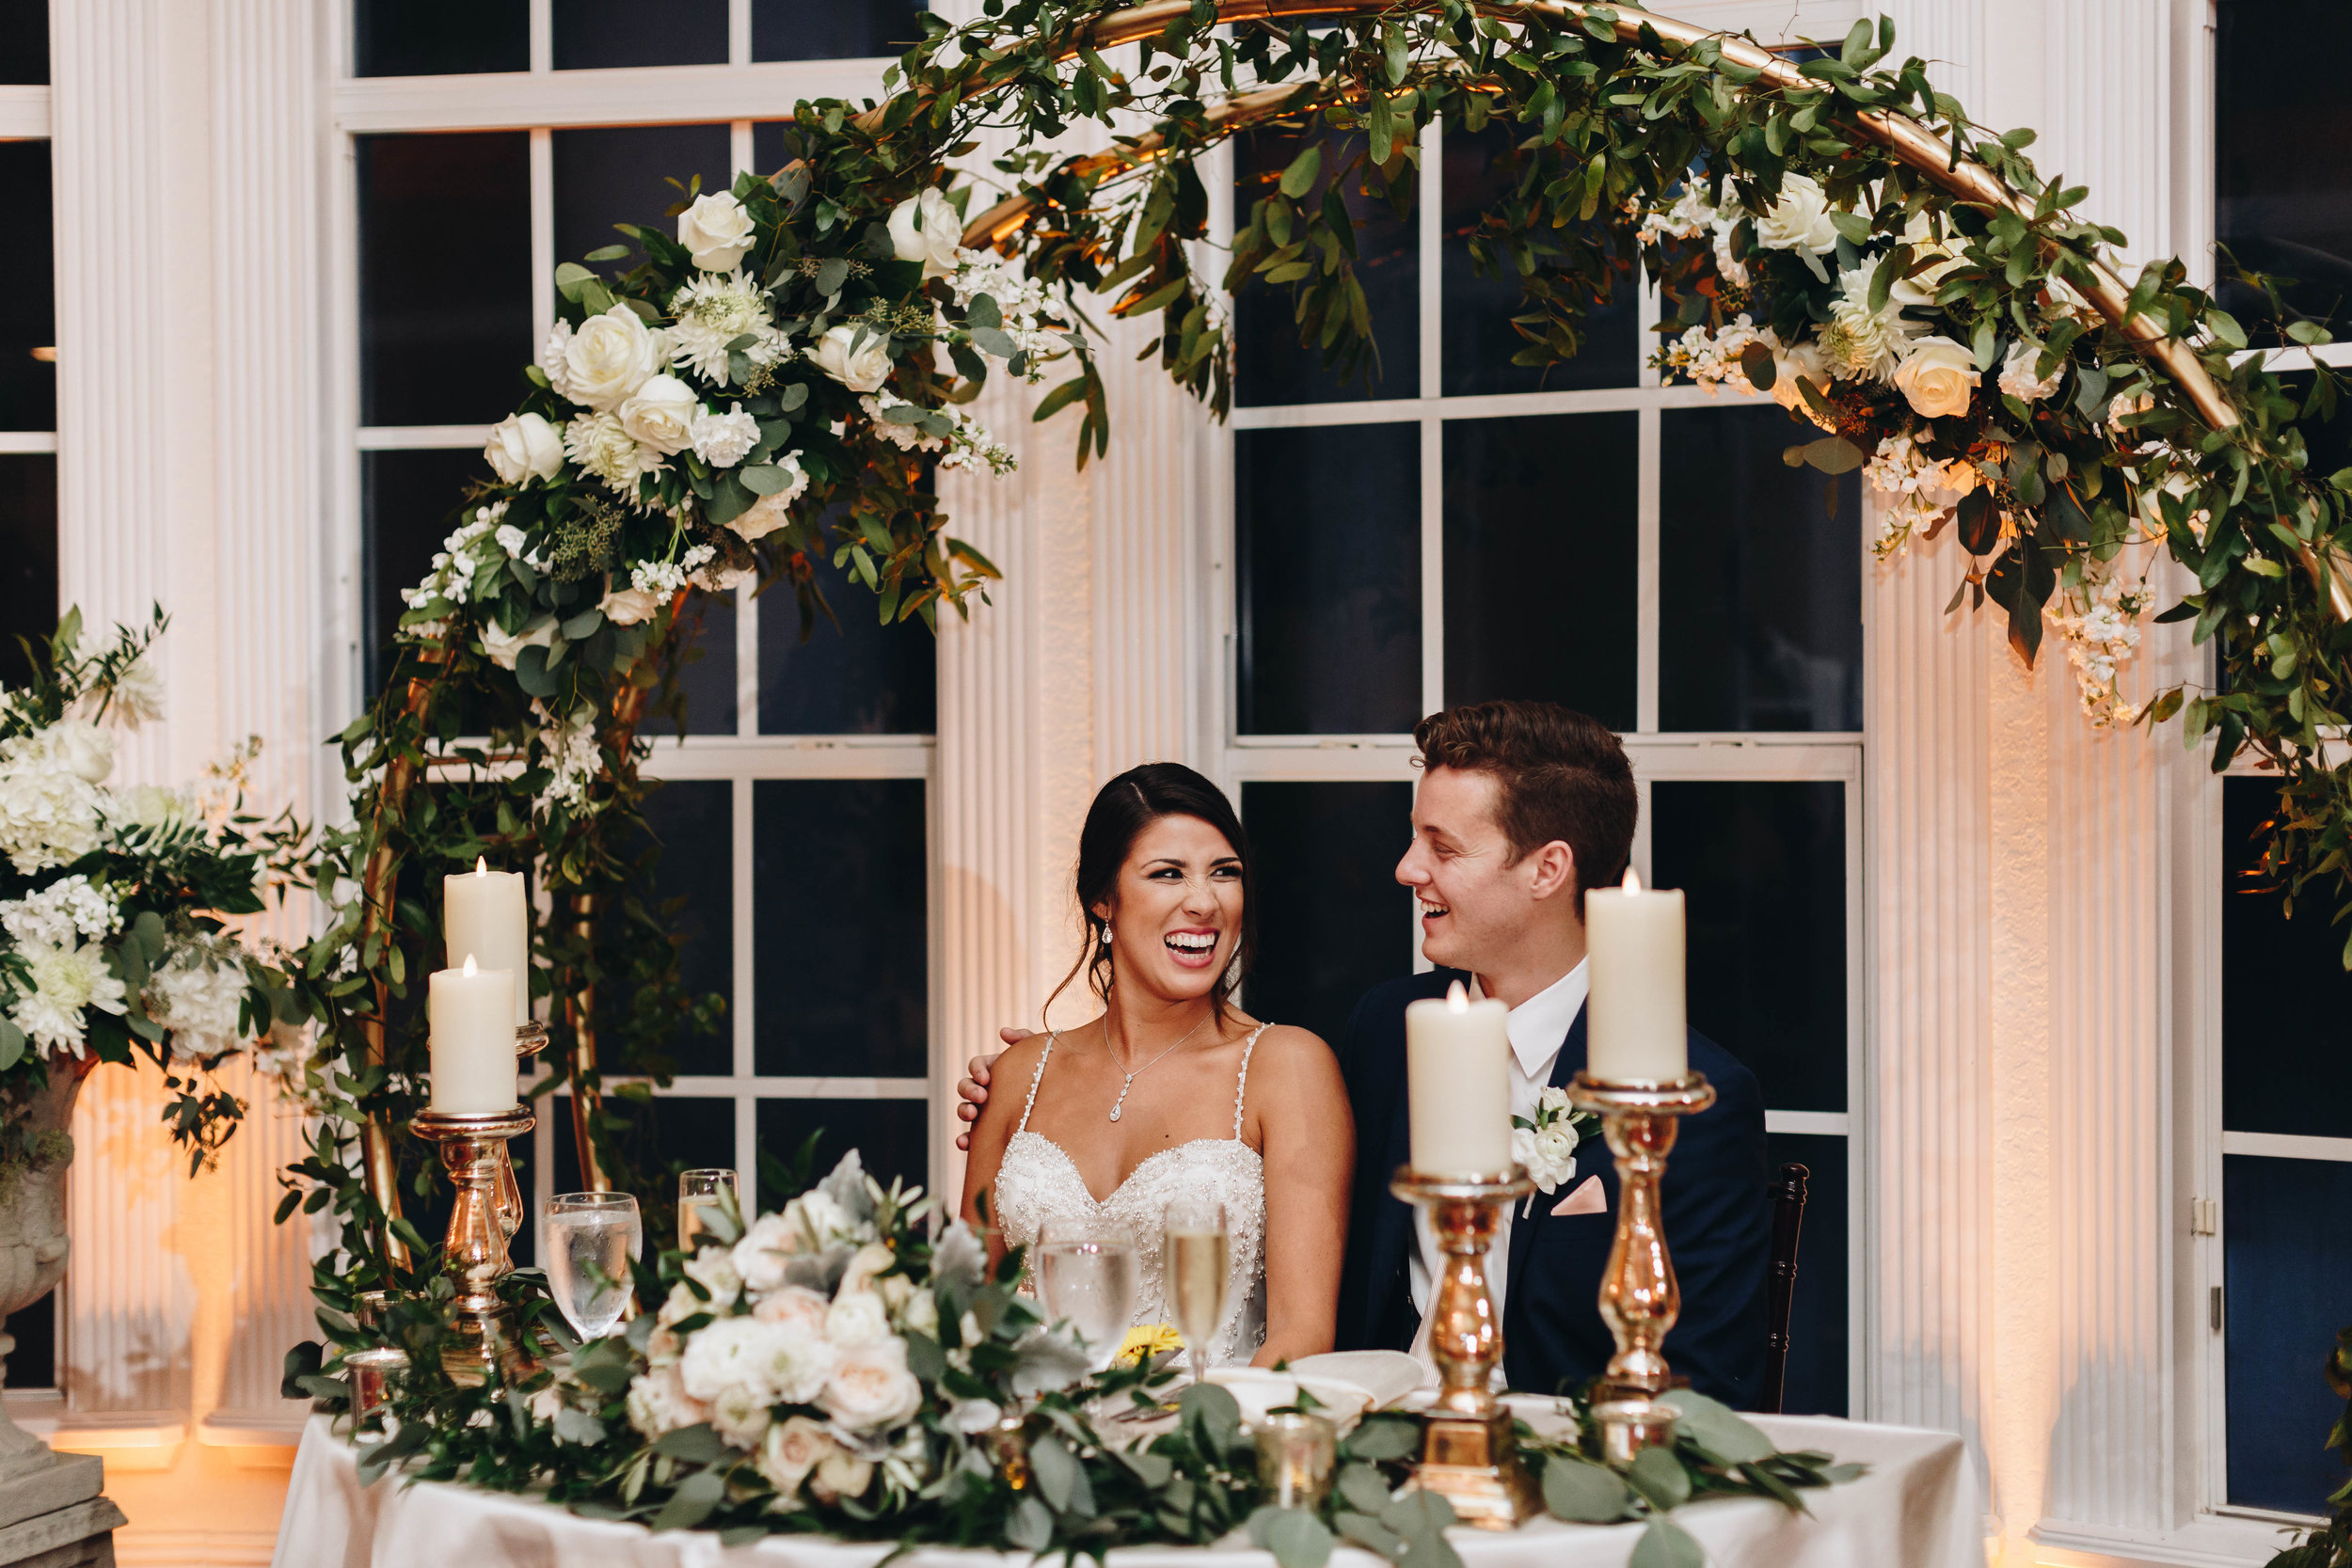 42fe3-luxmoregrandestatewedding.jpgluxmoregrandestatewedding.jpg